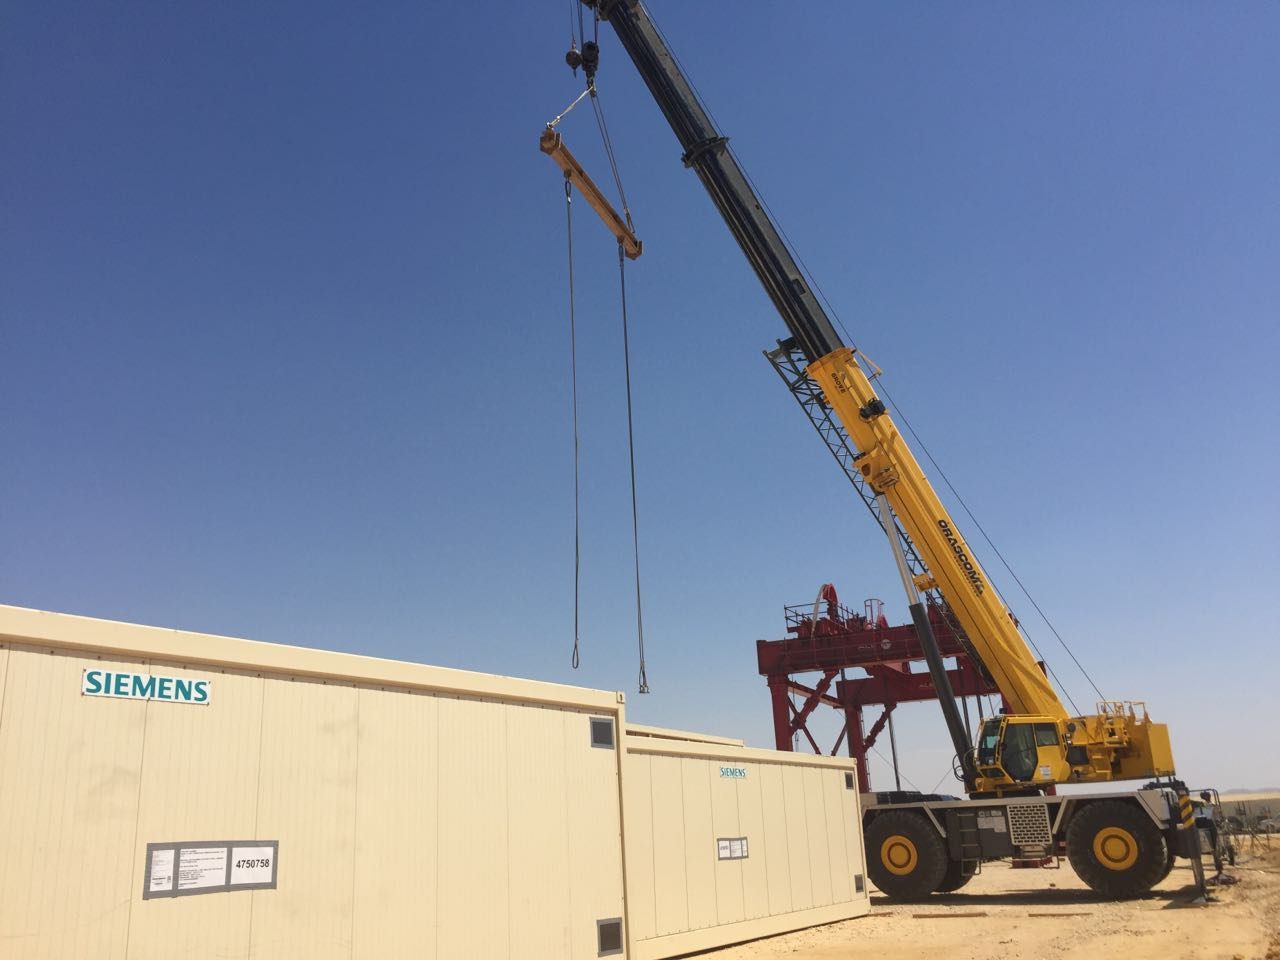 Orascom Construction adds 24 Grove rough-terrain cranes to its fleet -2